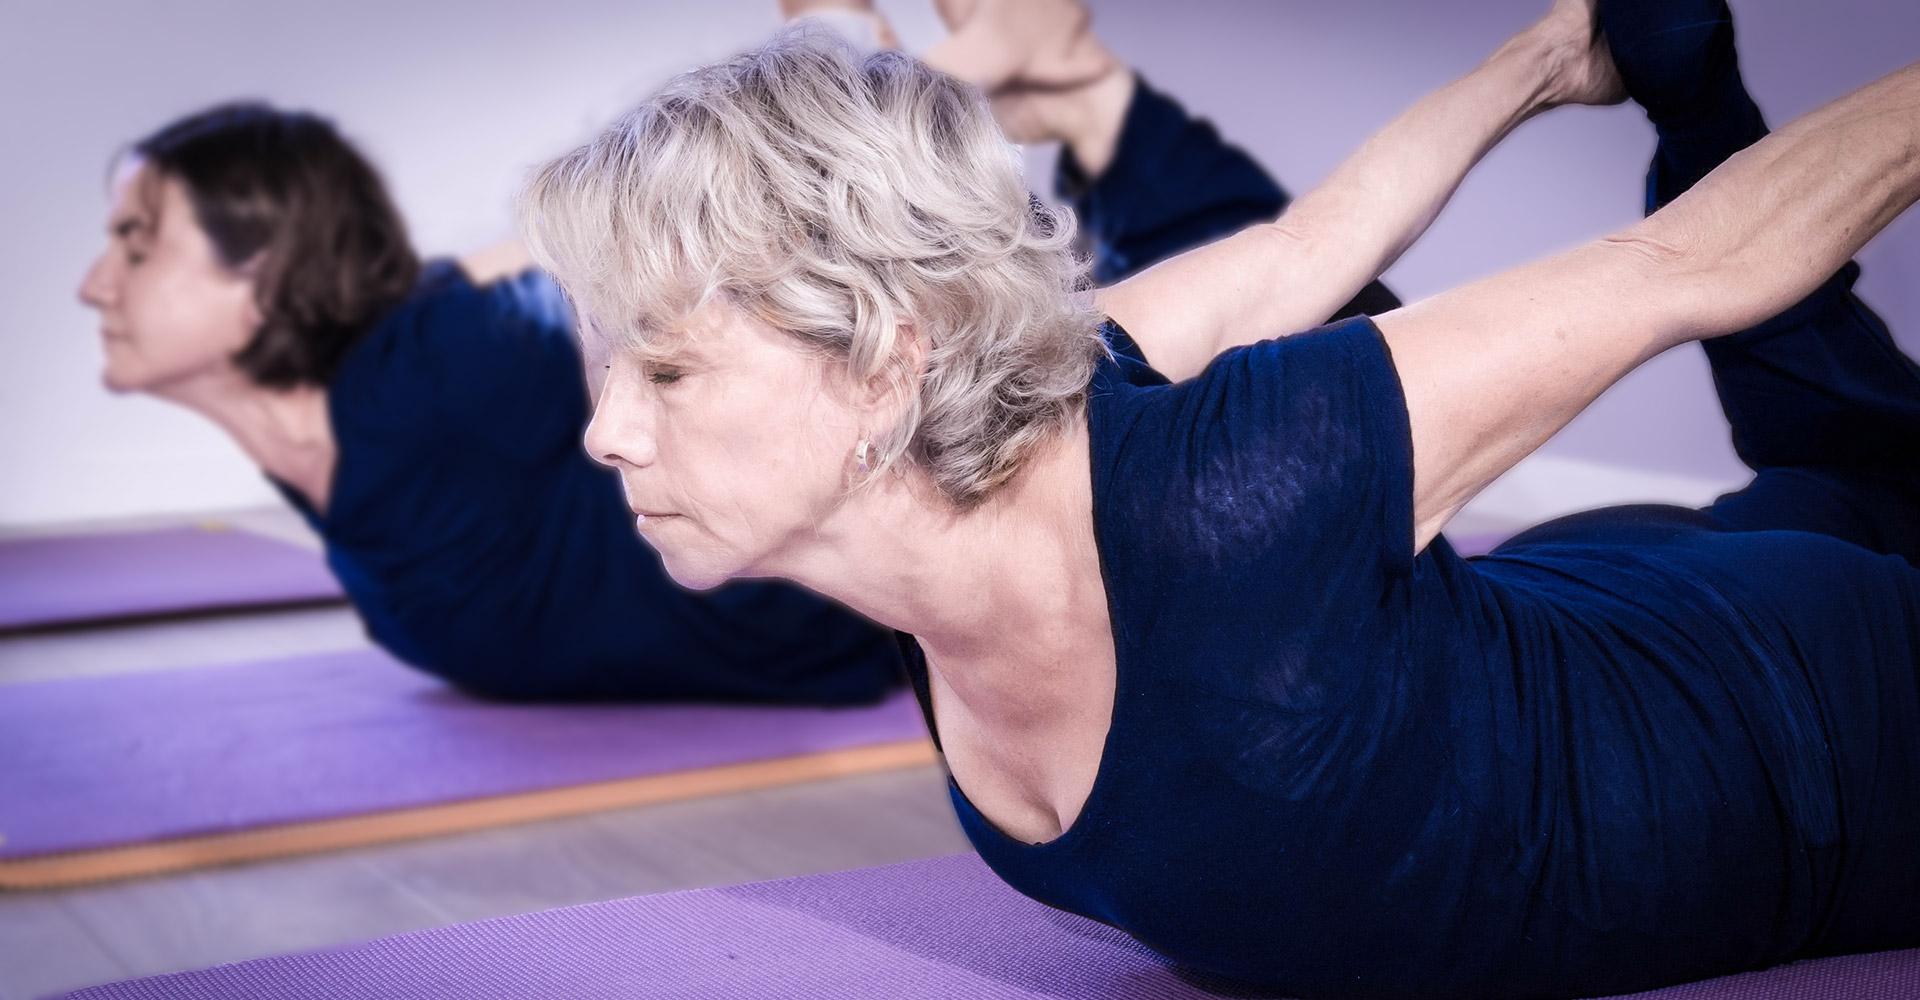 posture-de-hatha-yoga-centre-anjayati-val-d-oise